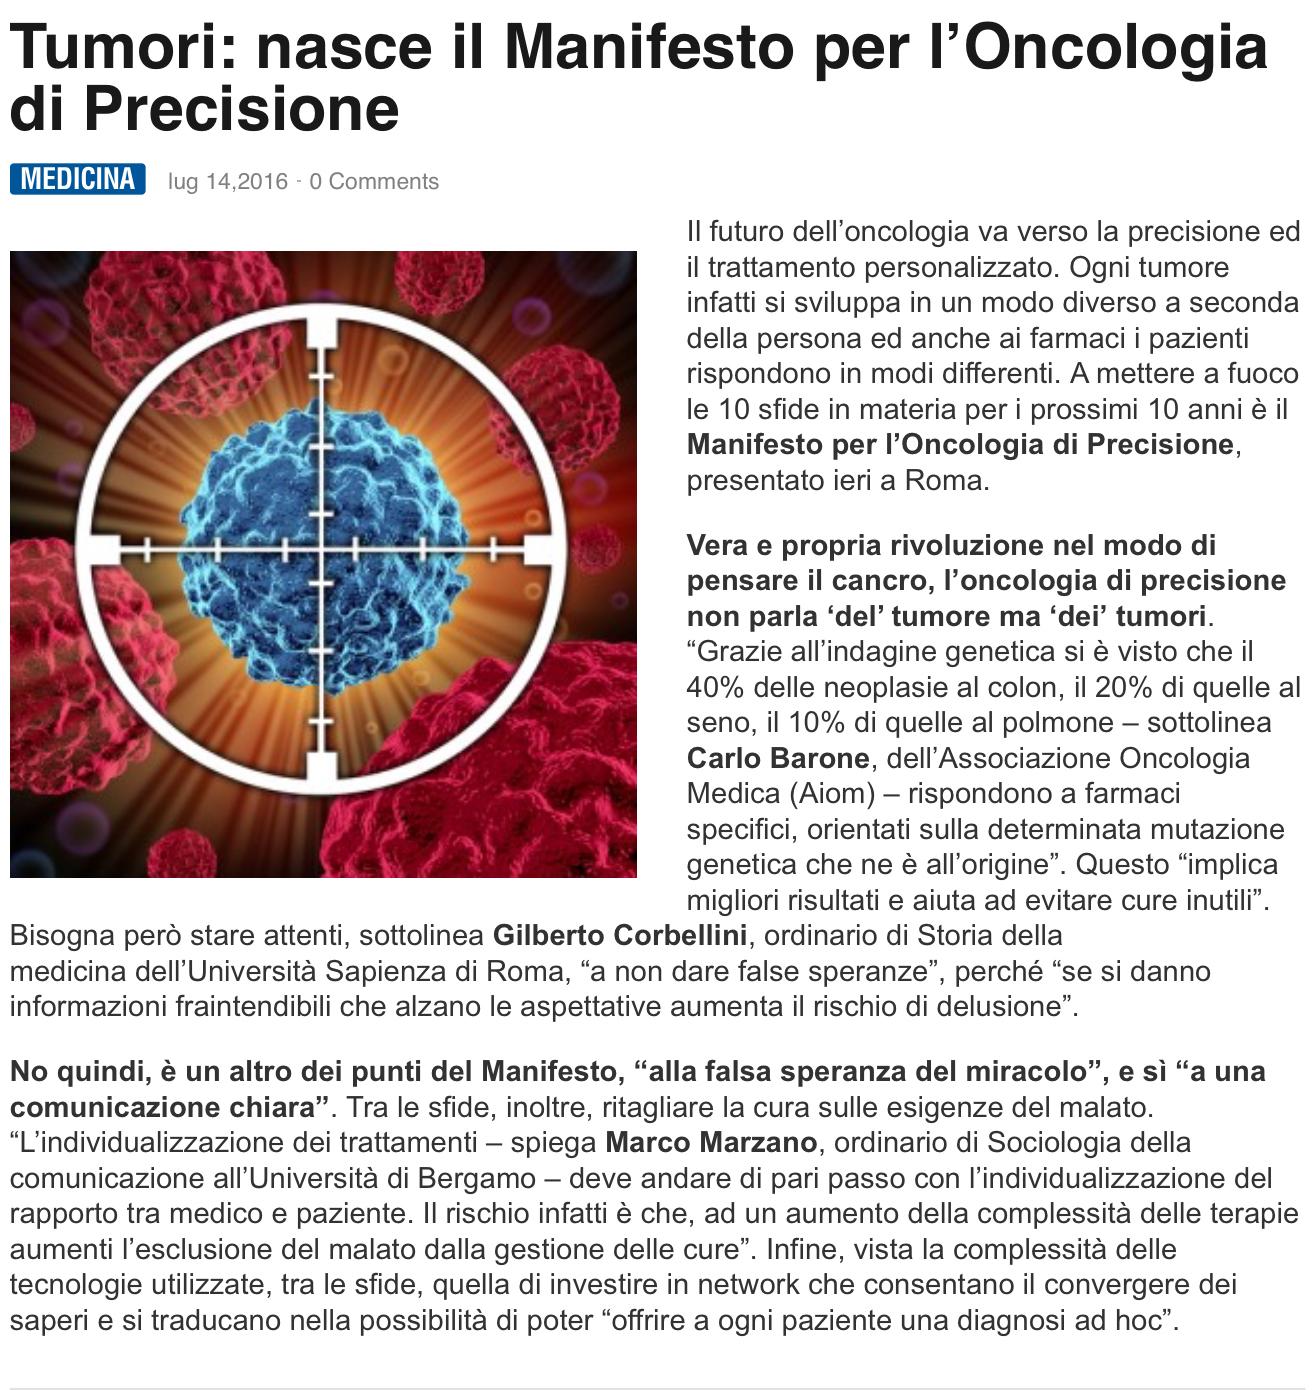 OncologiaPrecisioneOK